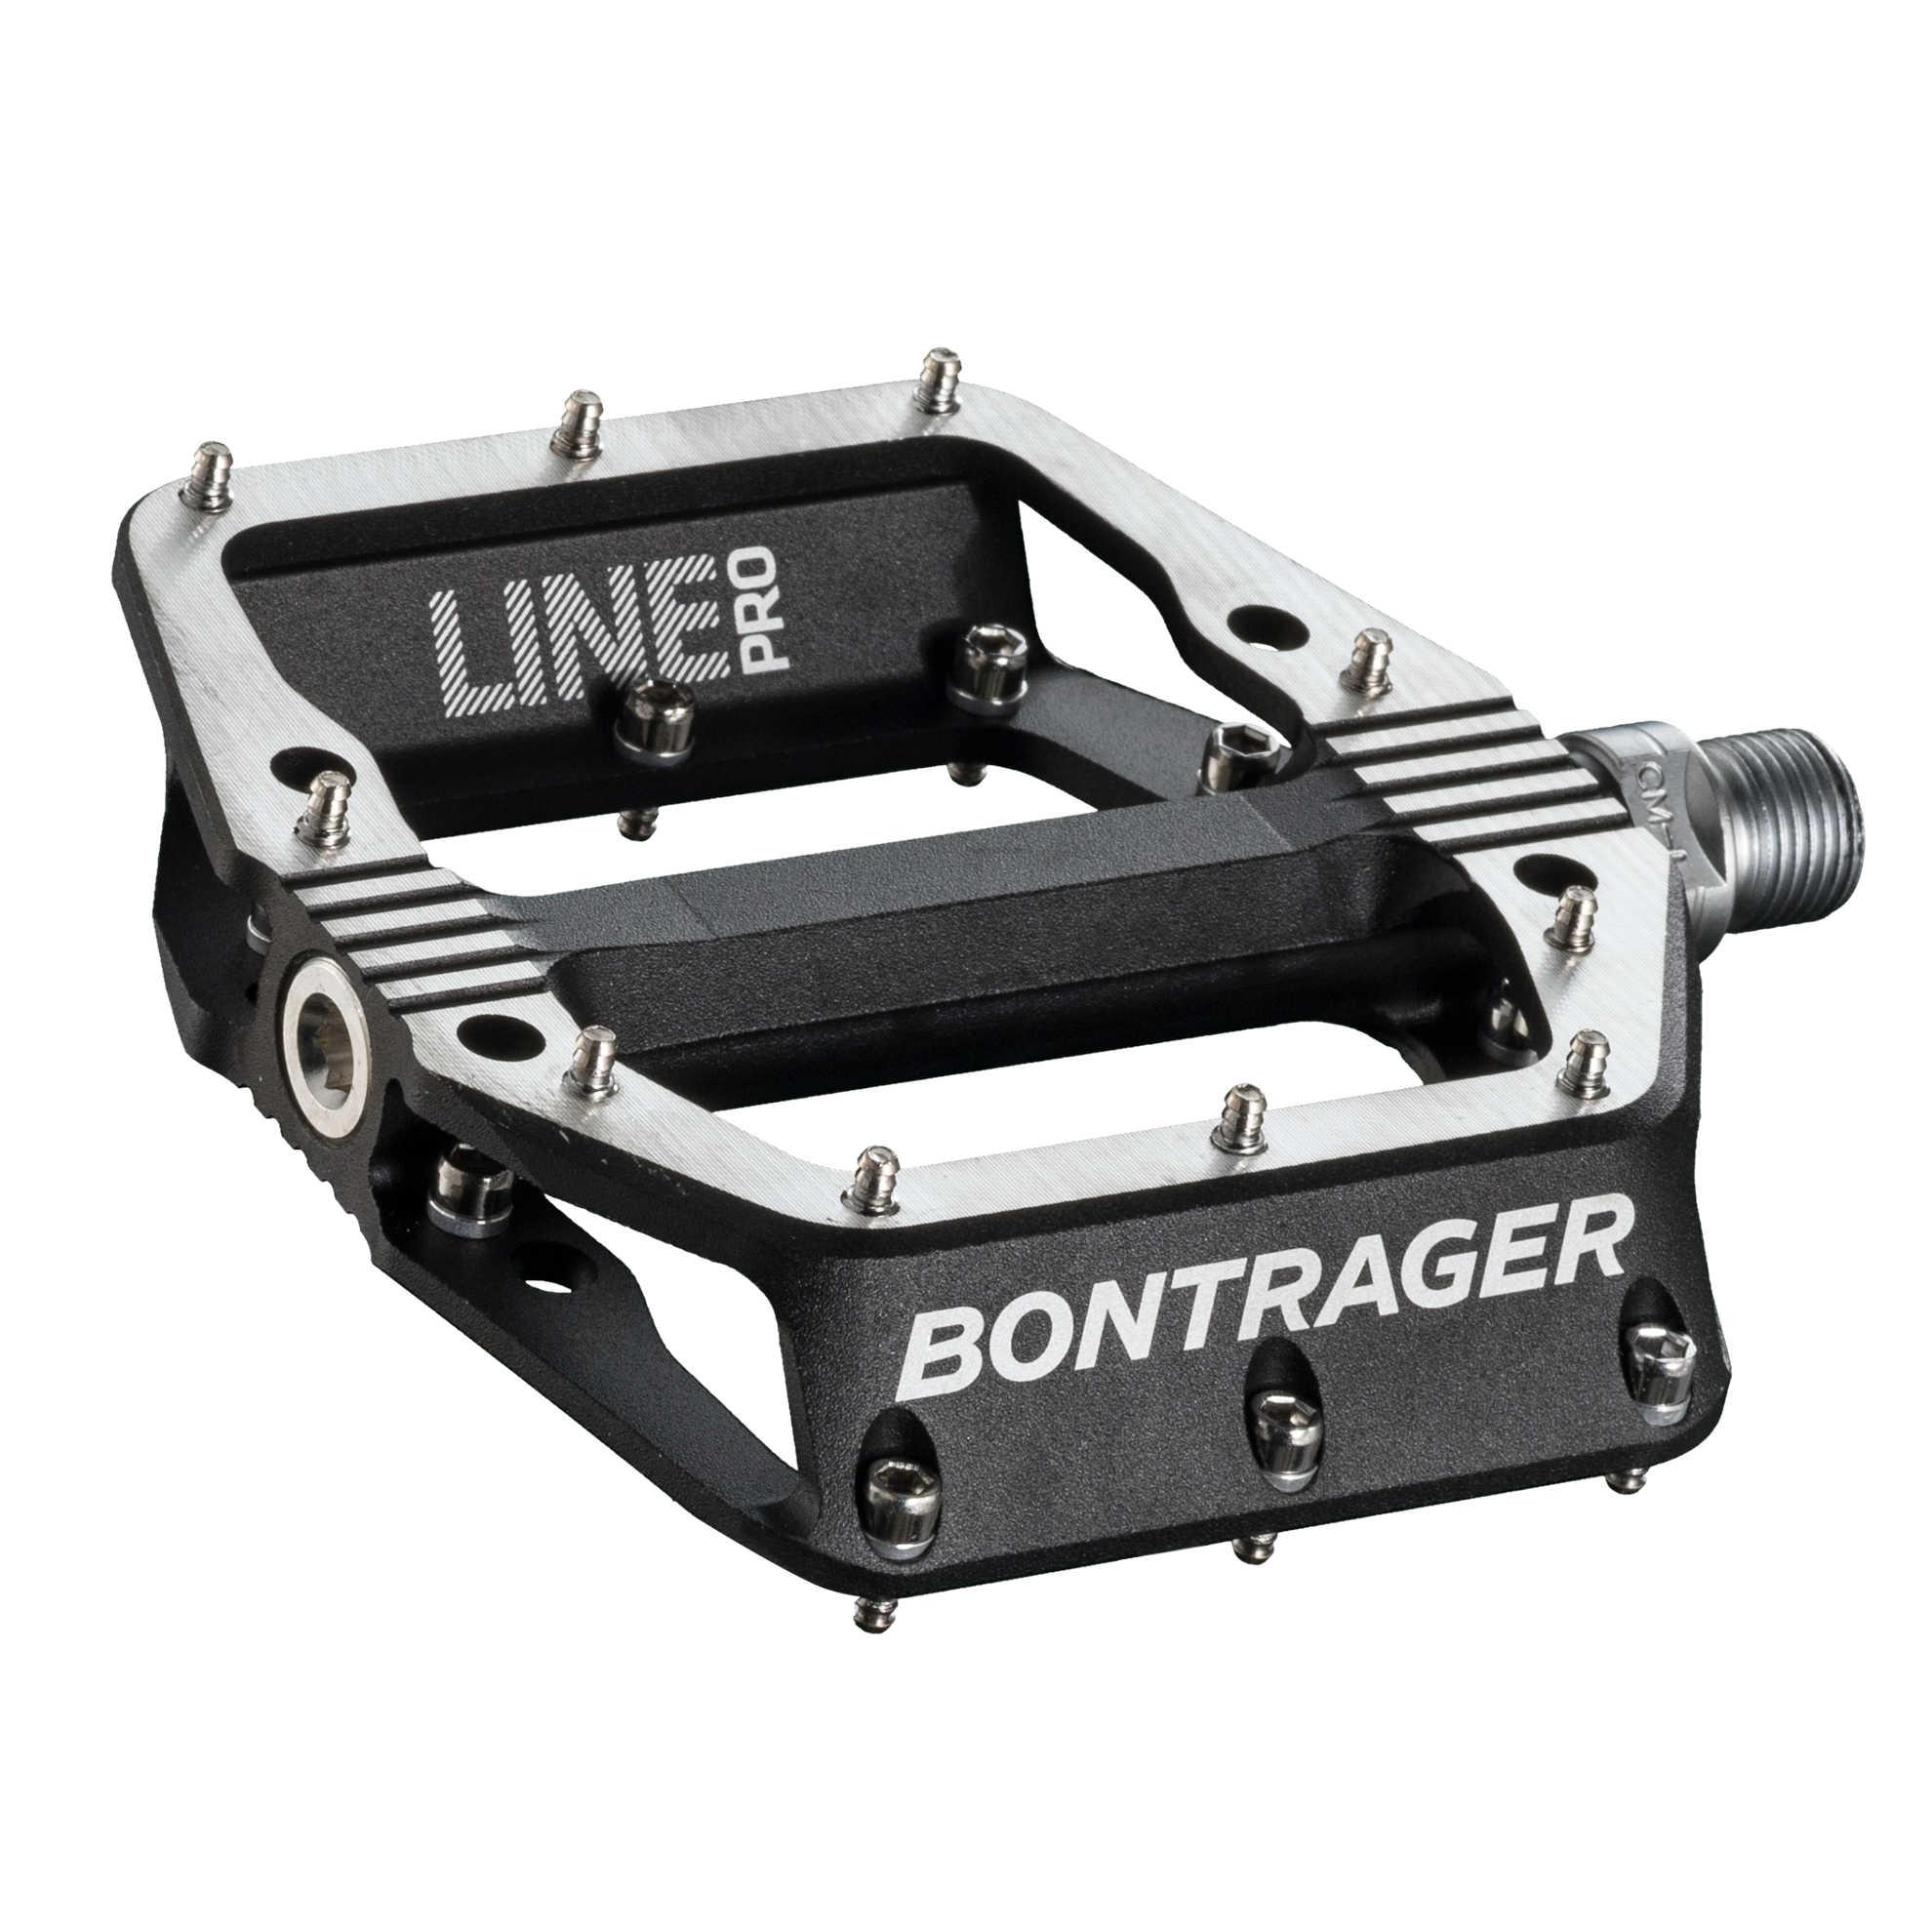 BONTRAGER LINE PRO par Bontrager (Pédales, Pièces & Composantes)BONTRAGER LINE PRO par Bontrager (Pédales, Pièces & Composantes)